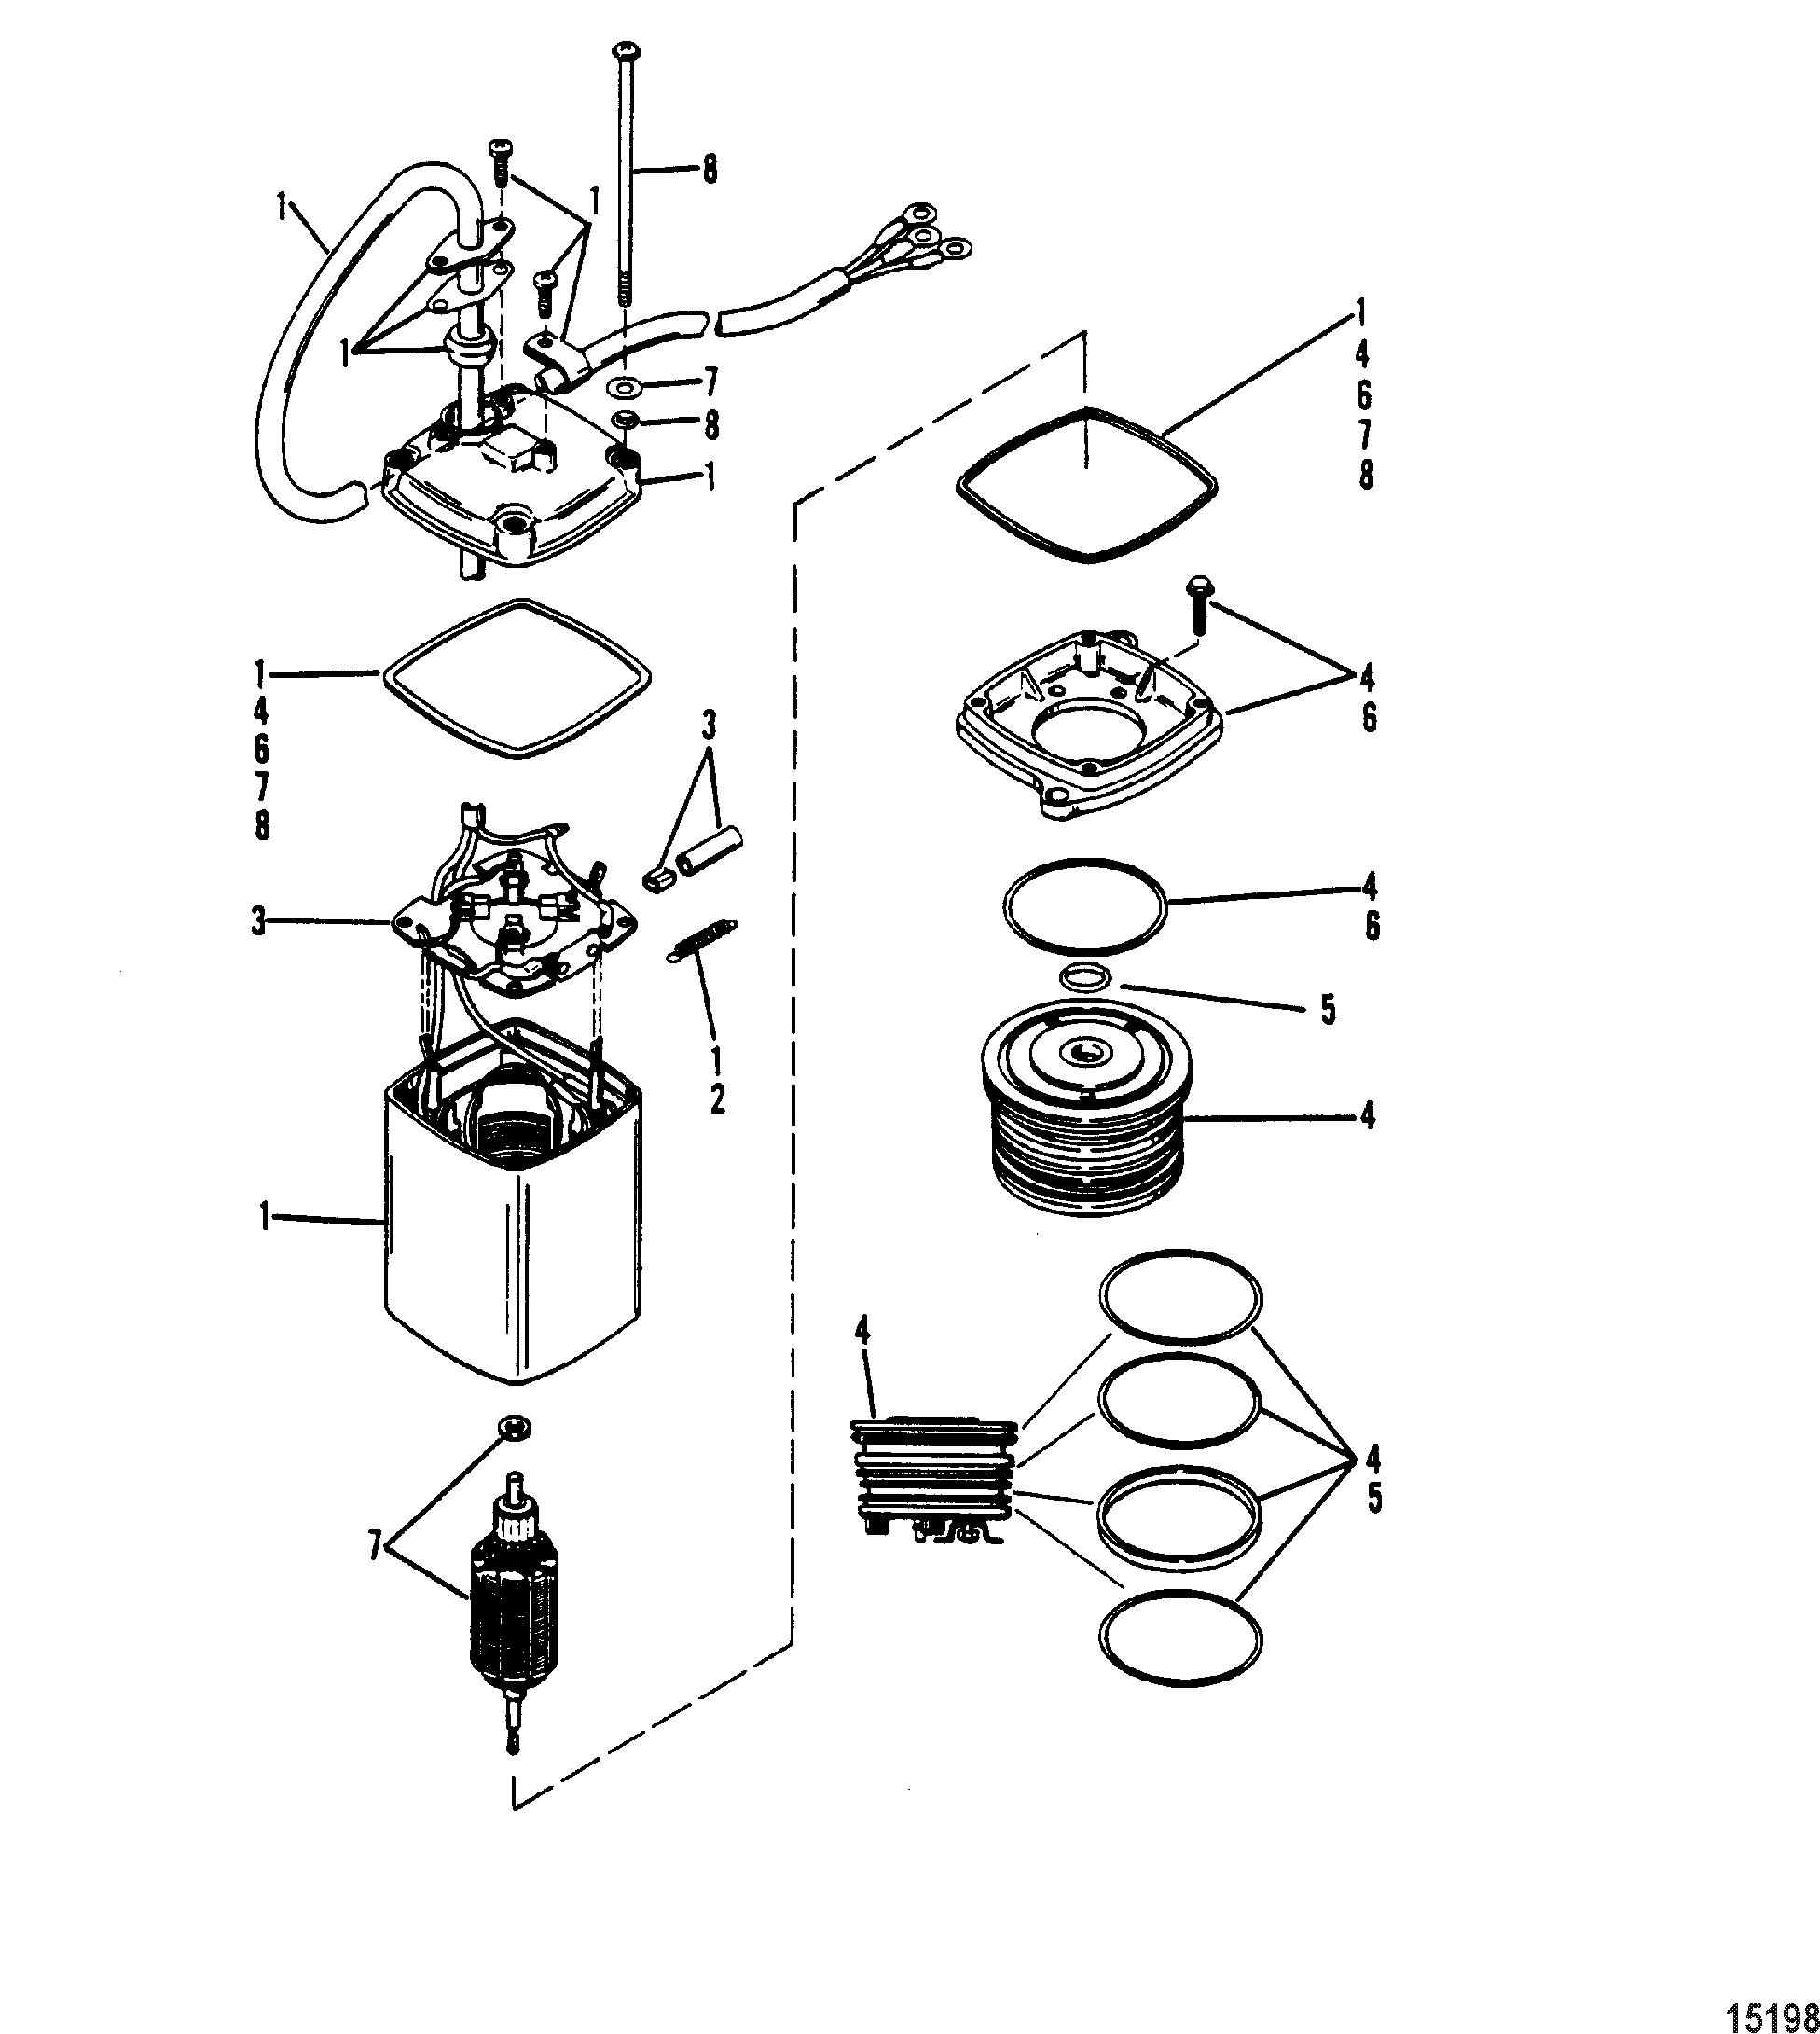 150hp Mercury Outboard Power Trim Wiring Diagram